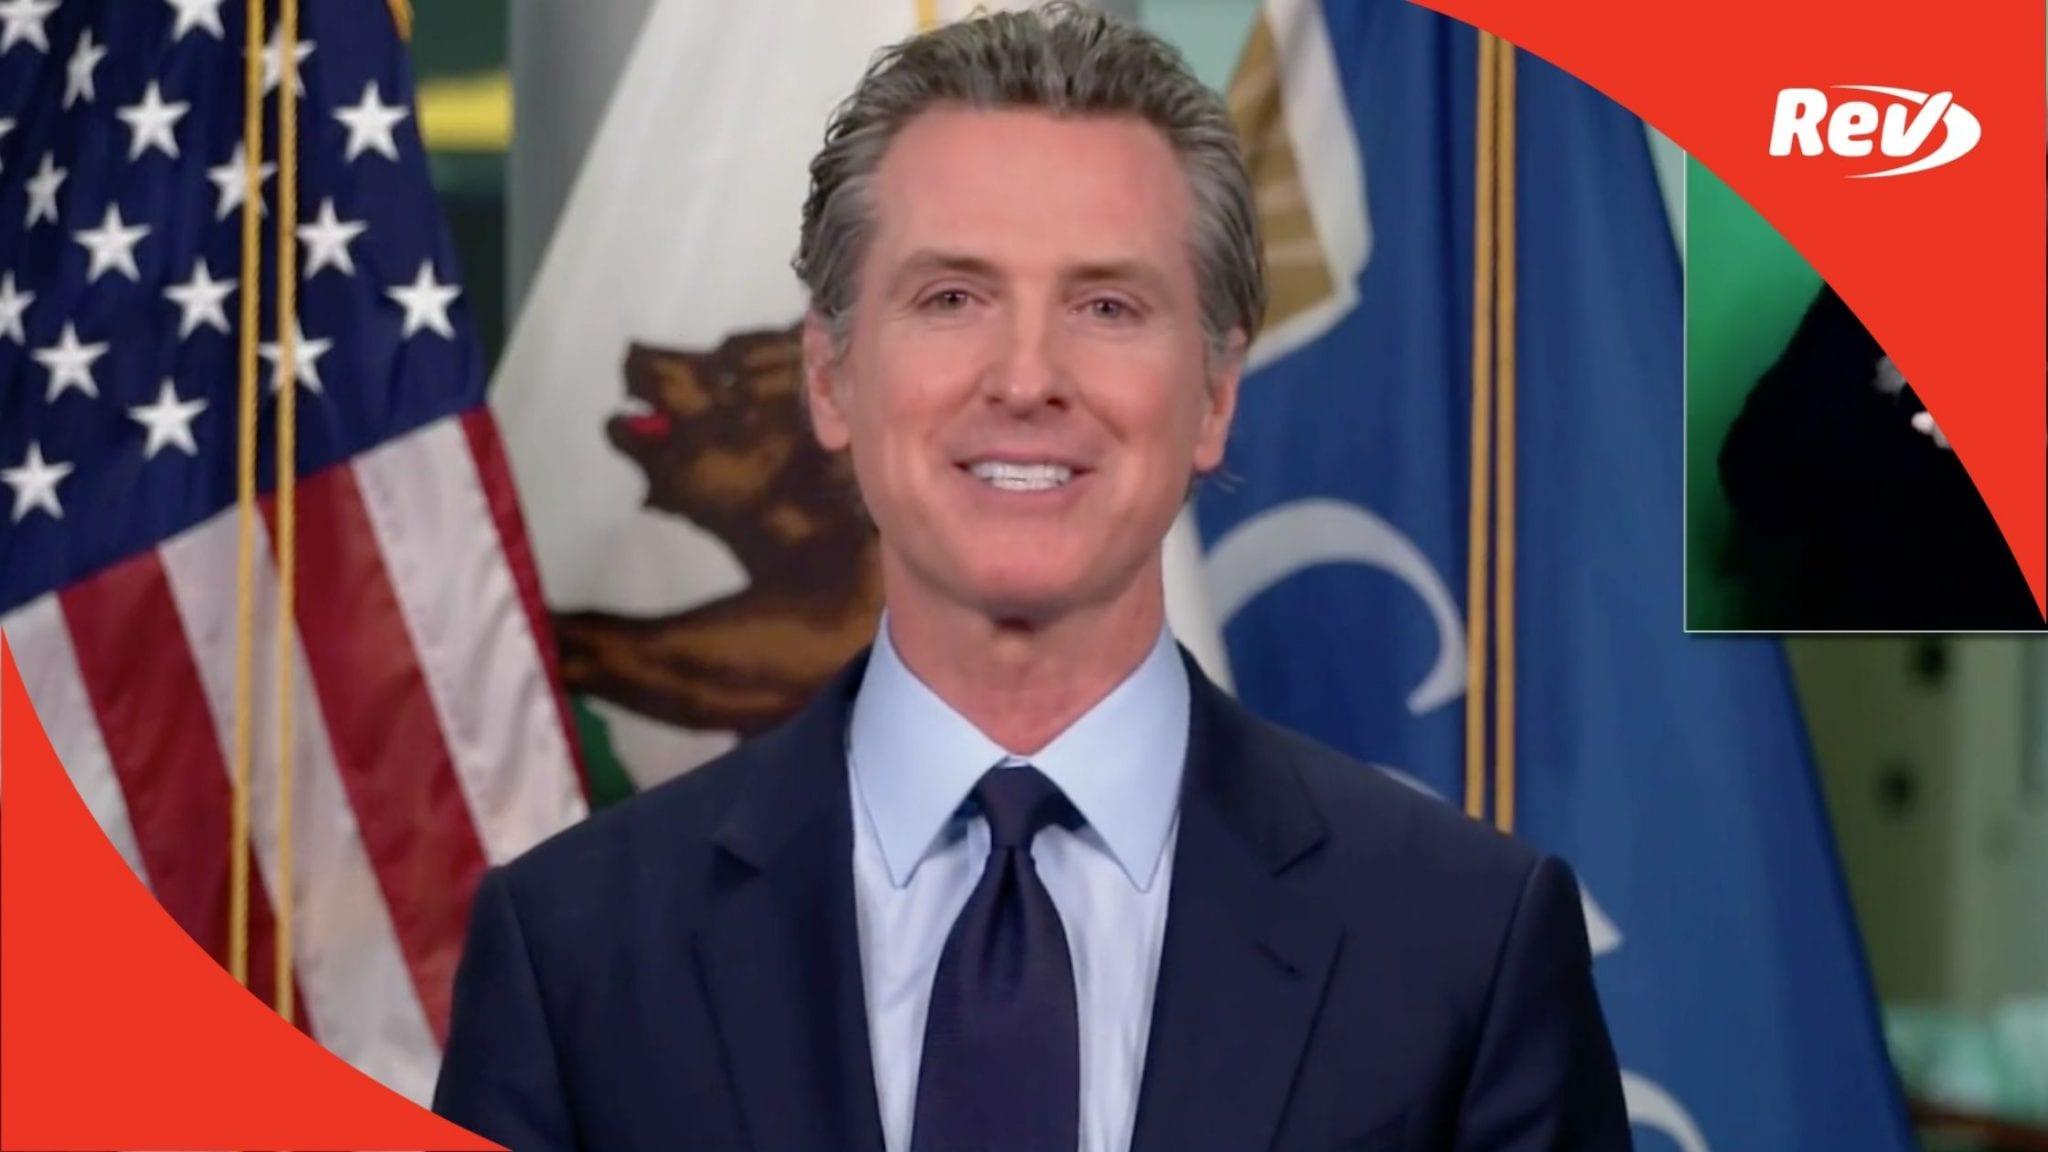 California Gov. Gavin Newsom COVID-19 Press Conference Transcript January 25